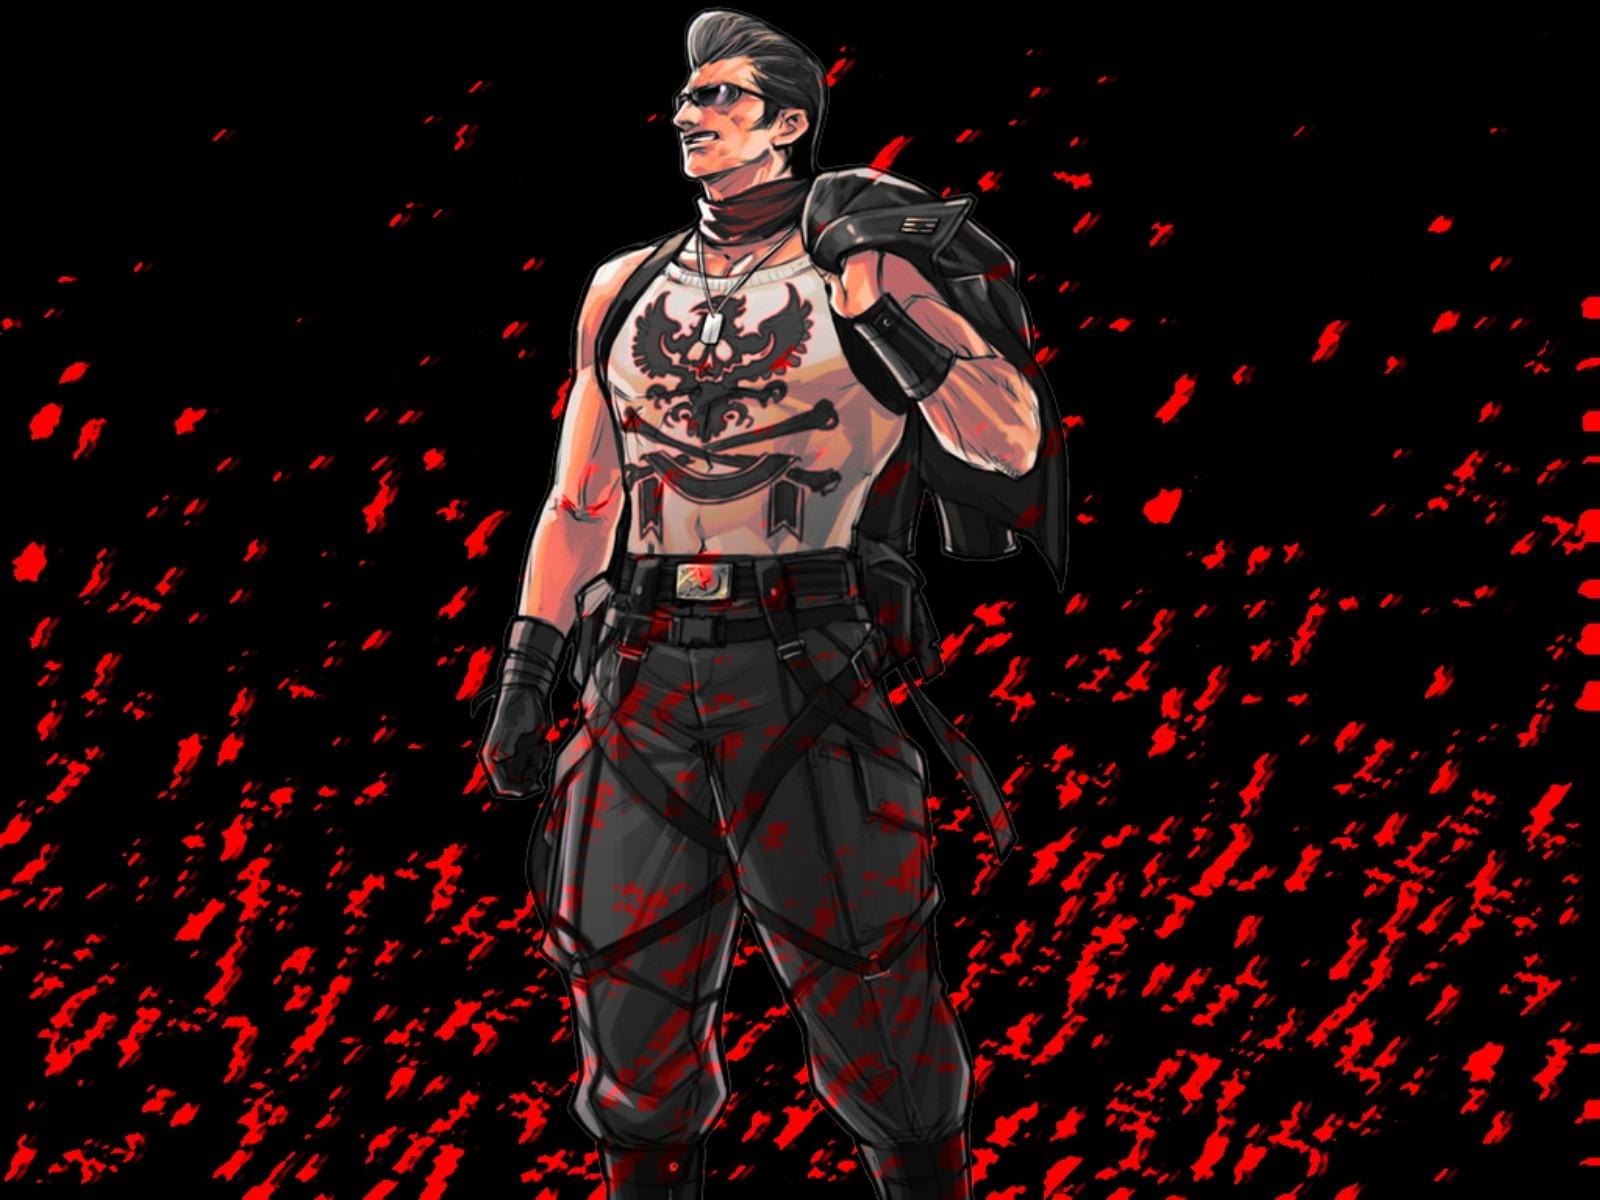 Wallpaper Illustration Video Games Advance Wars Days Of Ruin